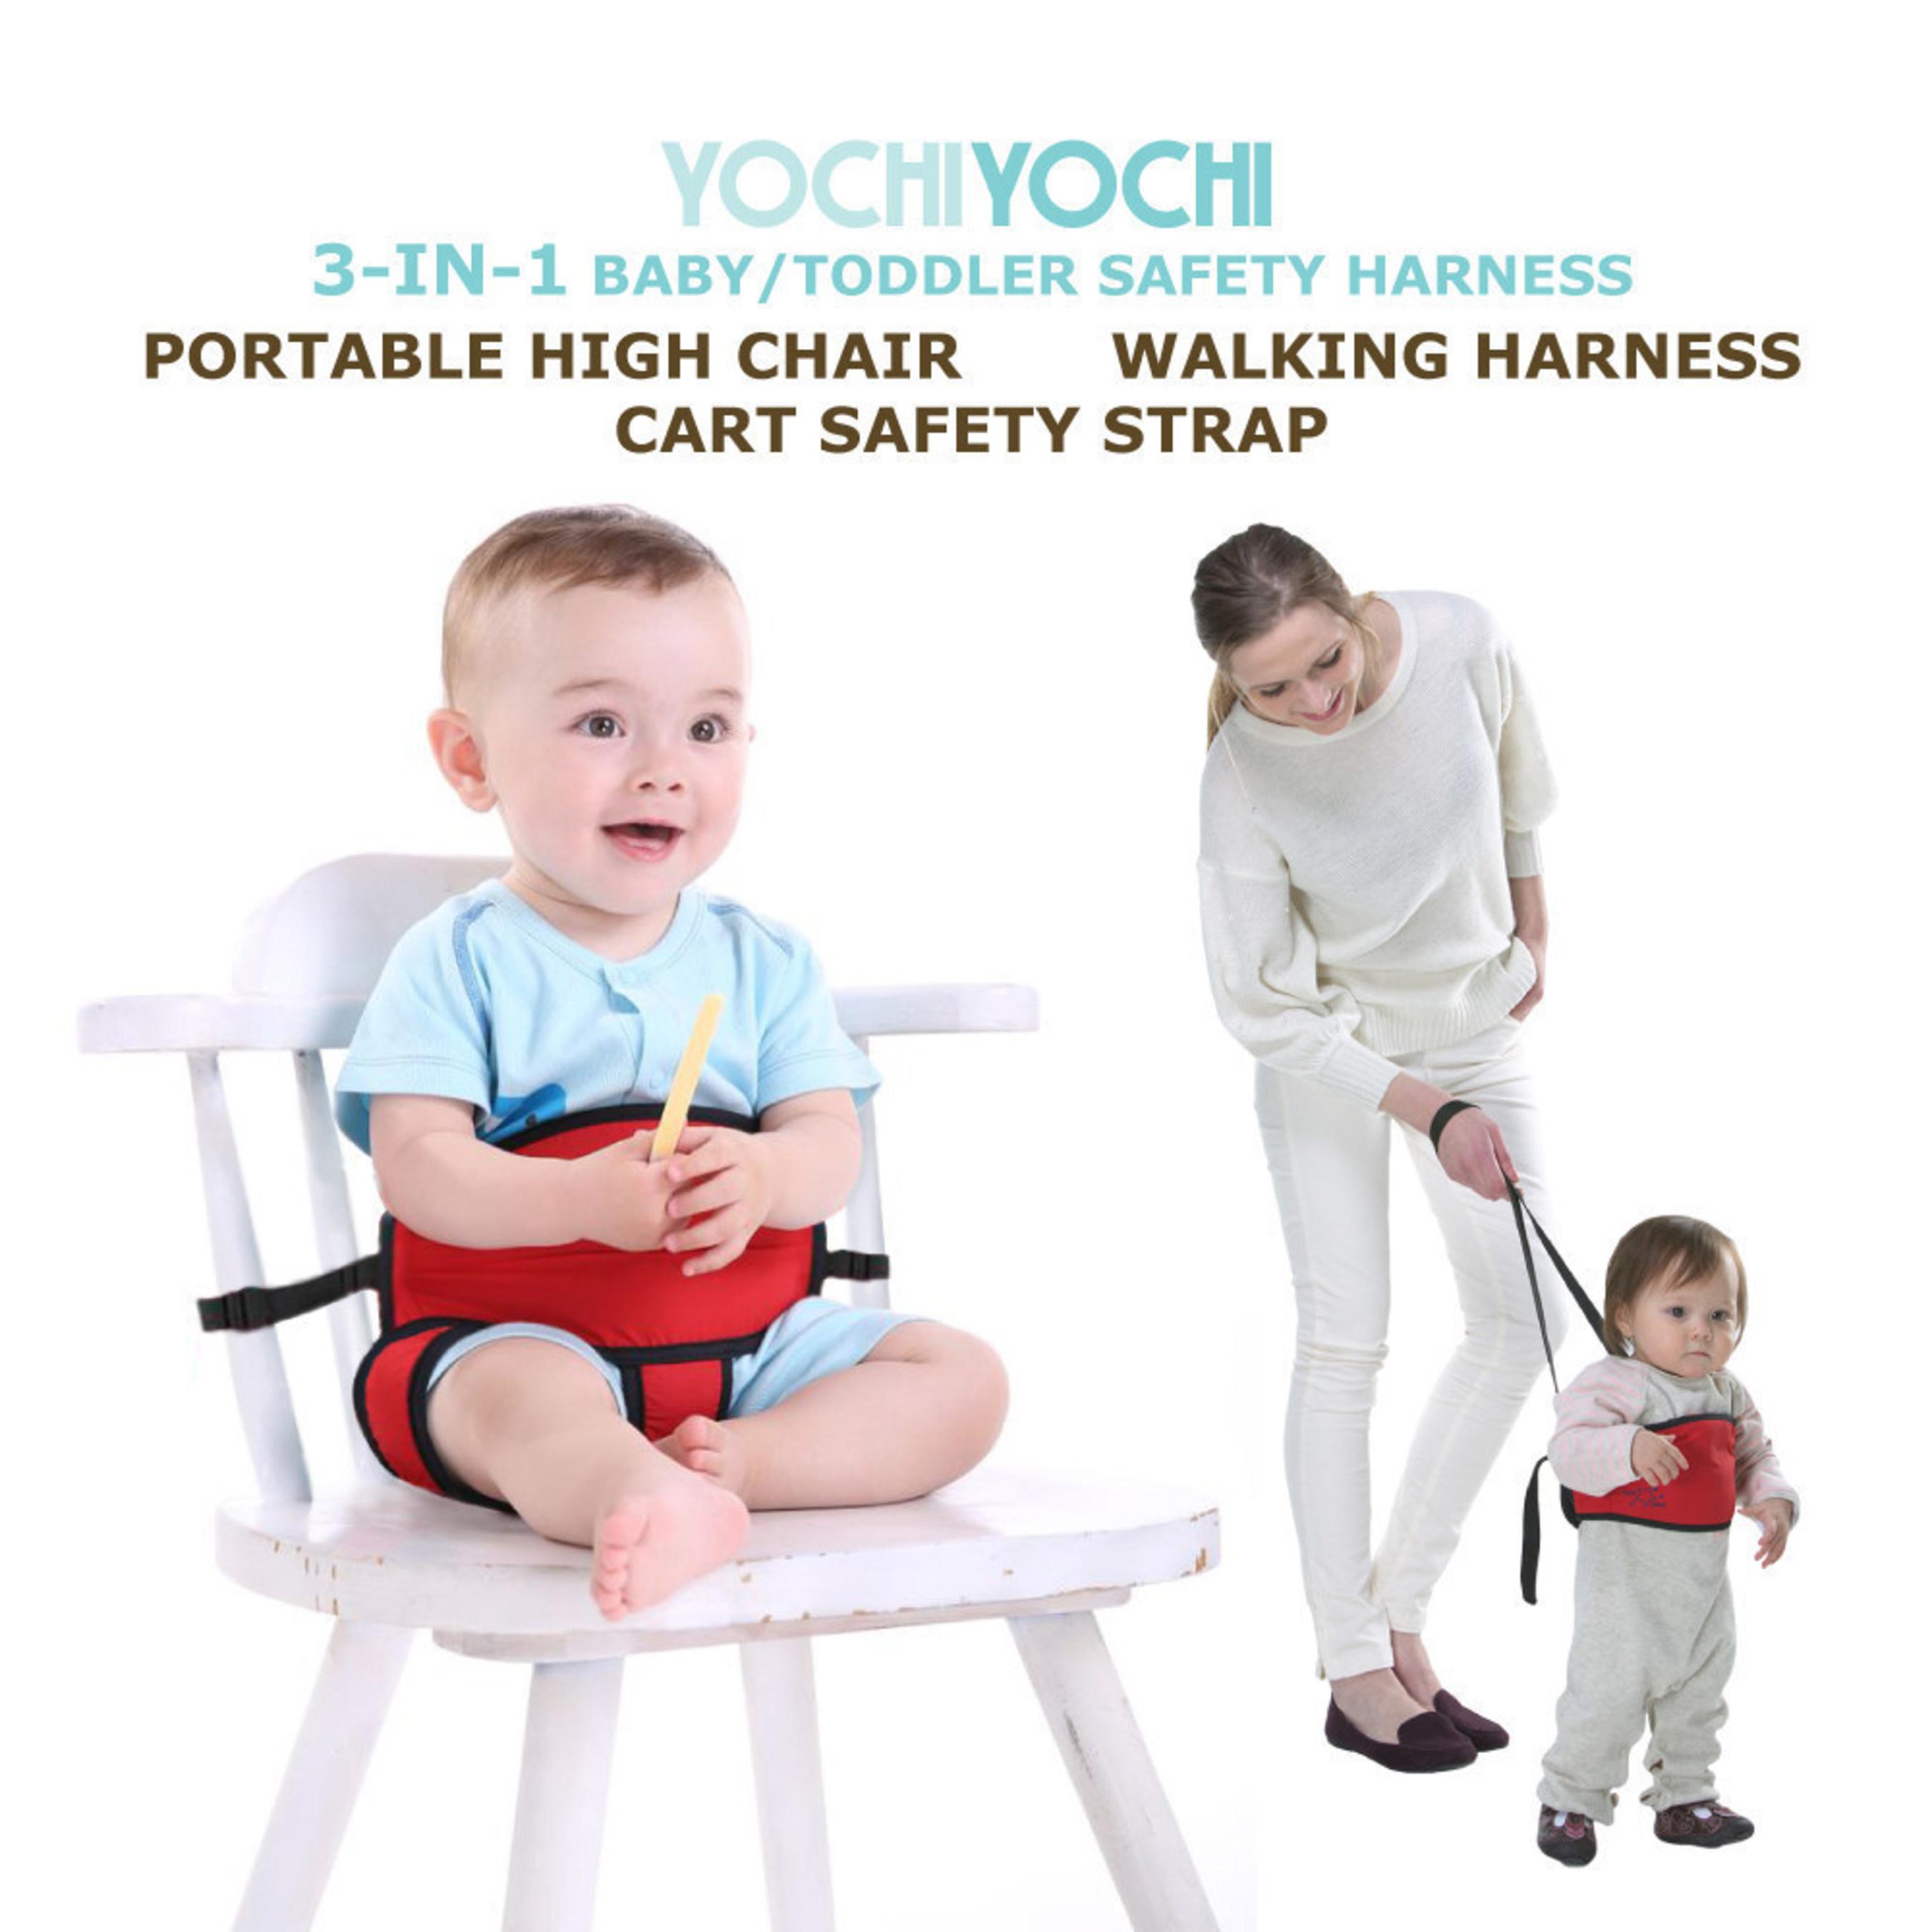 YOCHI YOCHI Is Proud Winner of Mom's Choice Awards